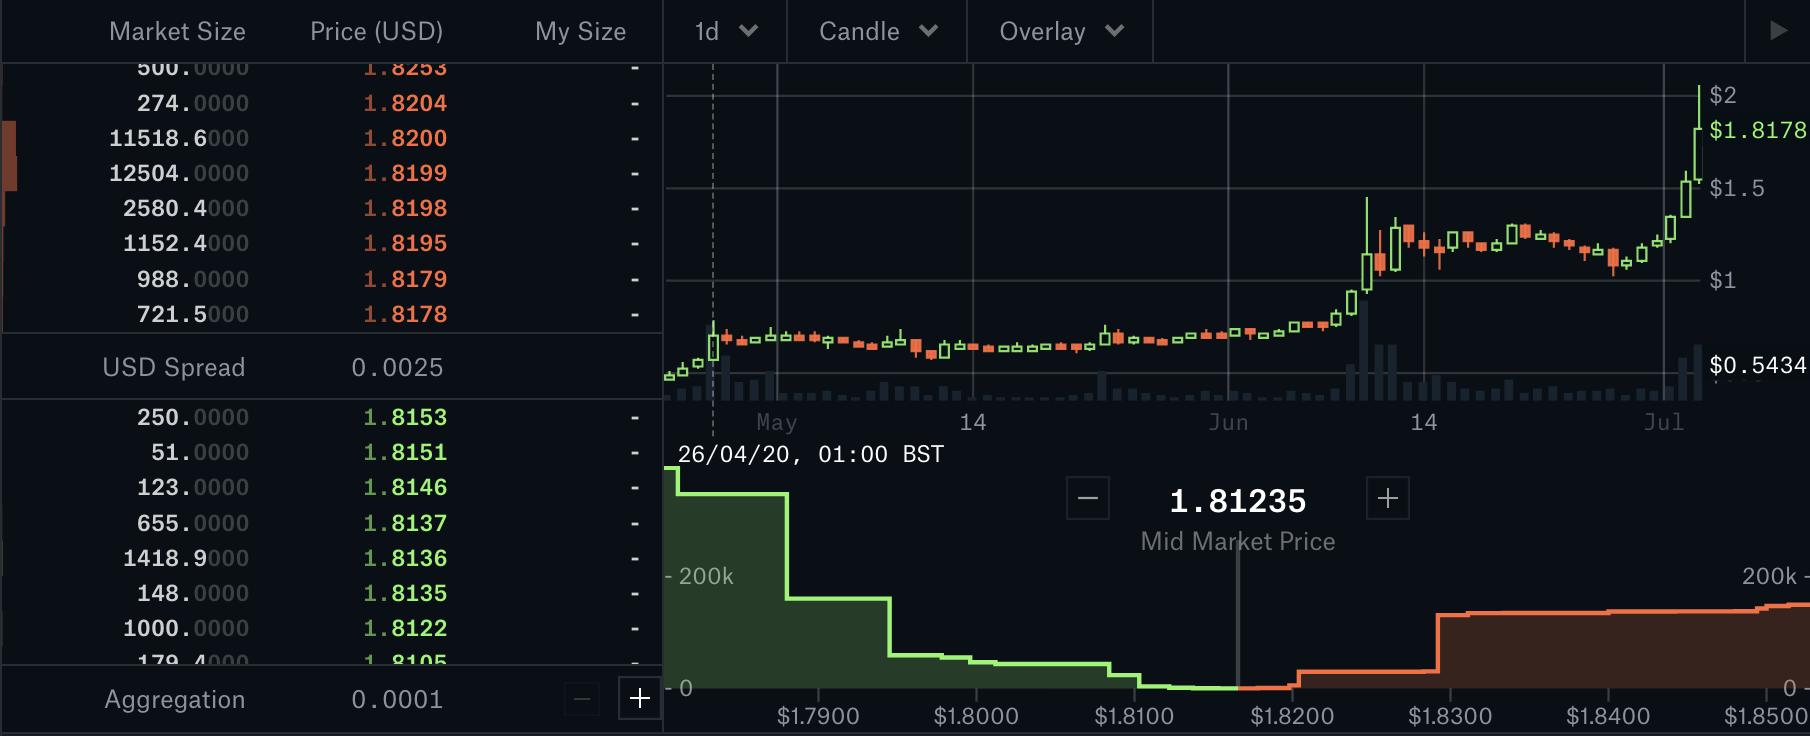 Kyber price, July 2020